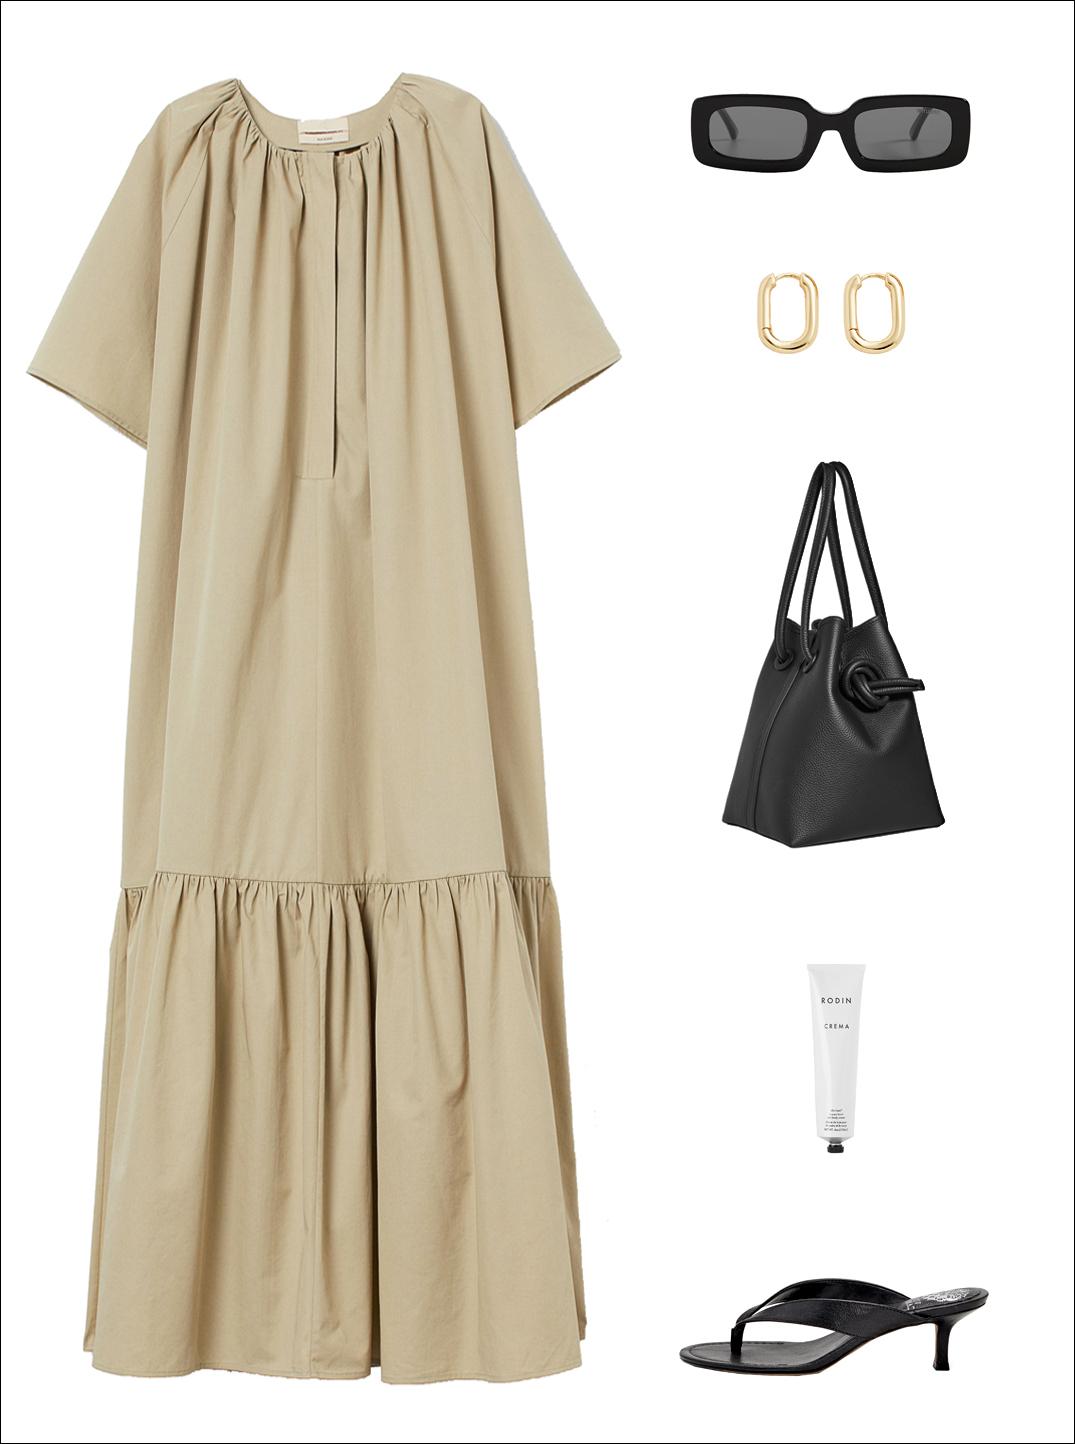 Minimalist Spring Outfit Idea: Oversized Tan Dress, Rectangle Sunglasses, Oval Hoop Earrings, Black Bucket Bag, Rodin Cream, and Flip Flop Kitten Heel Sandals